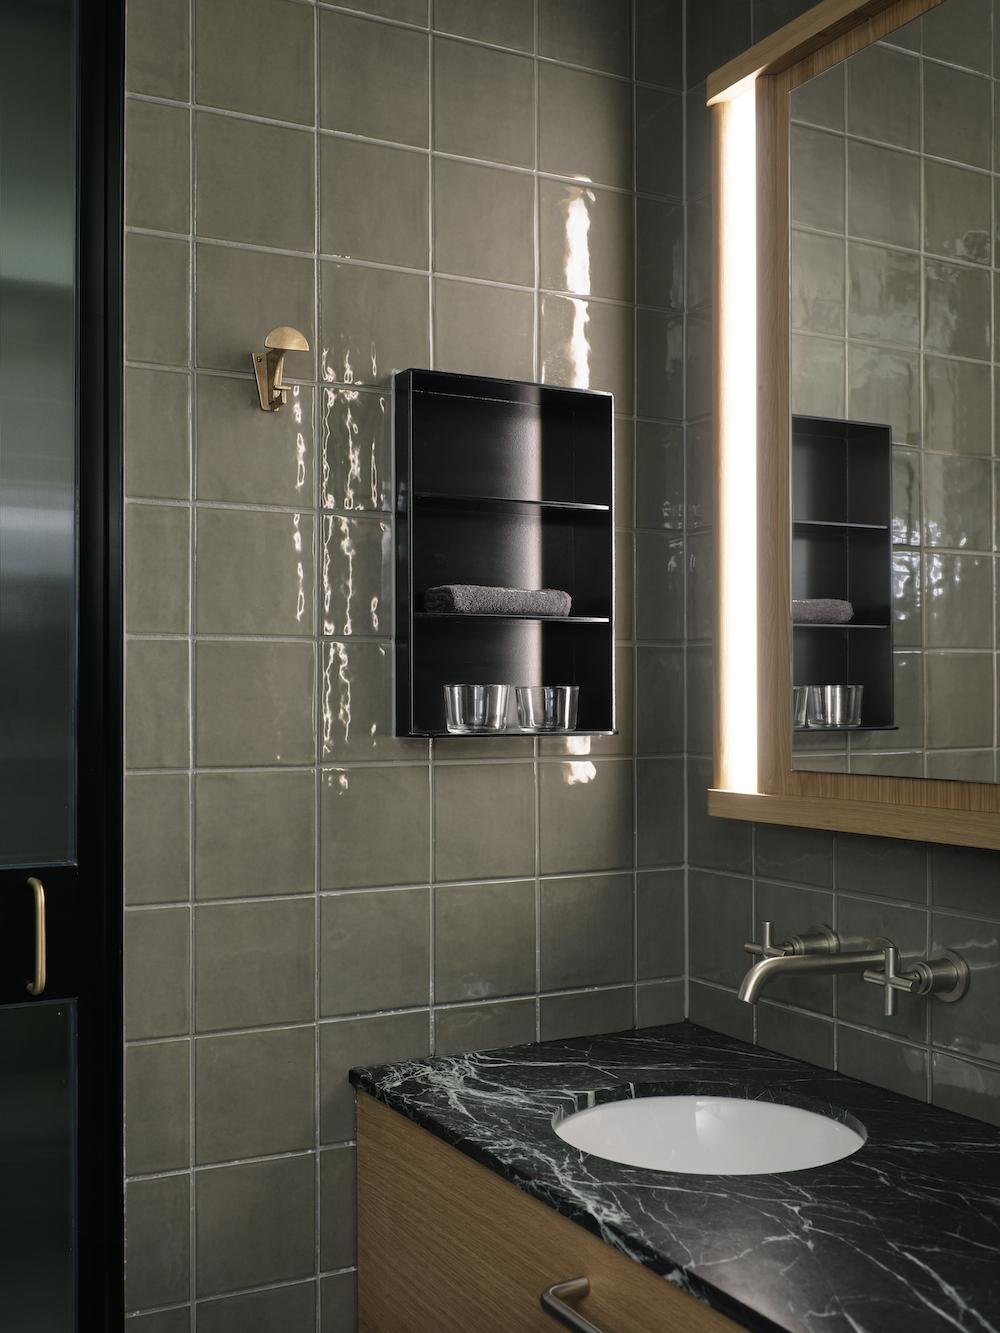 Tiled bathroom inside Ace Hotel Sydney